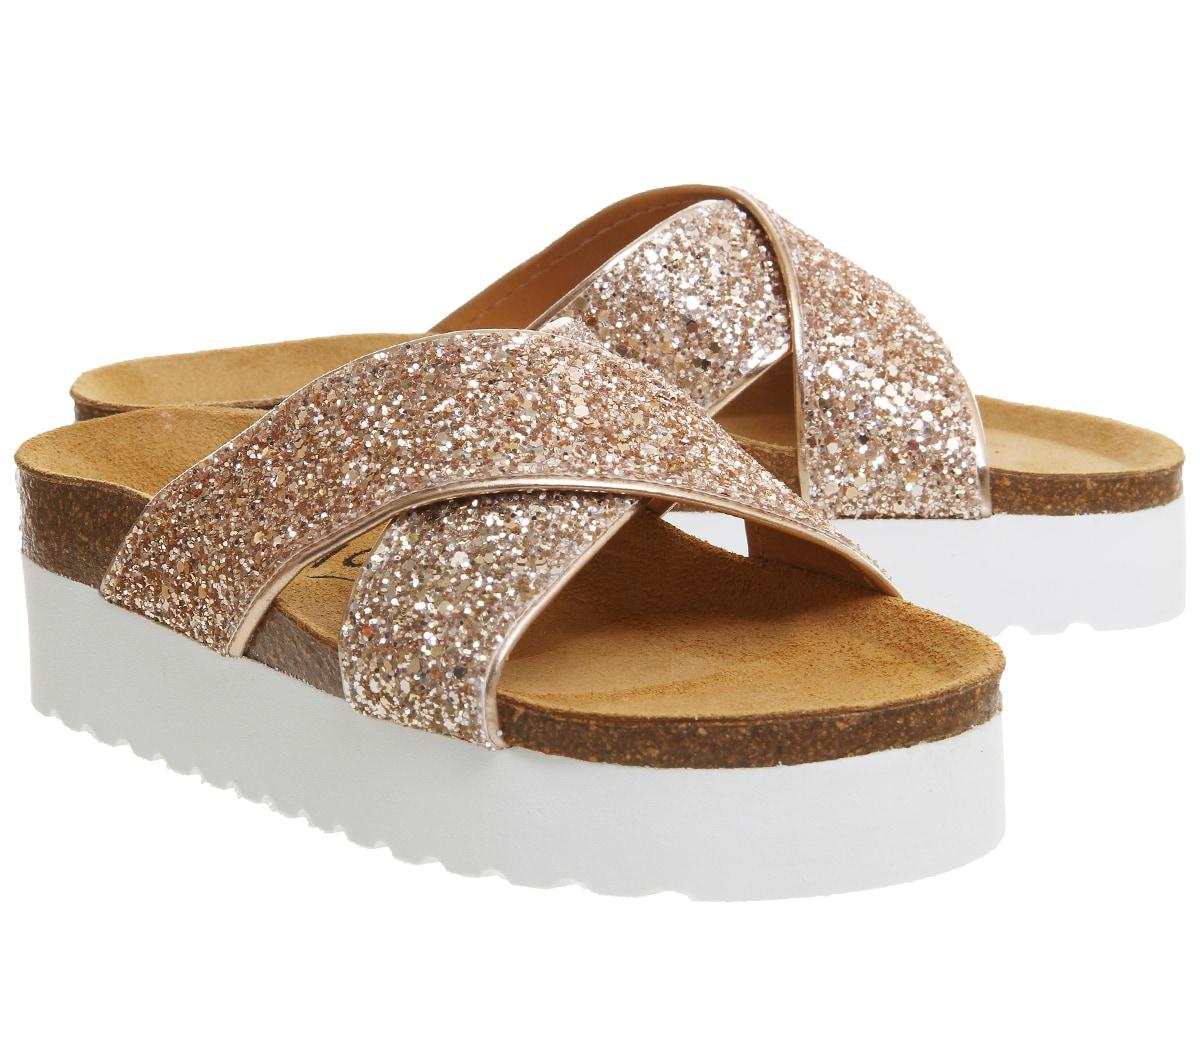 Womens Bedroom Slippers Womens Office Warner Platform Sandals Rose Gold Glitter